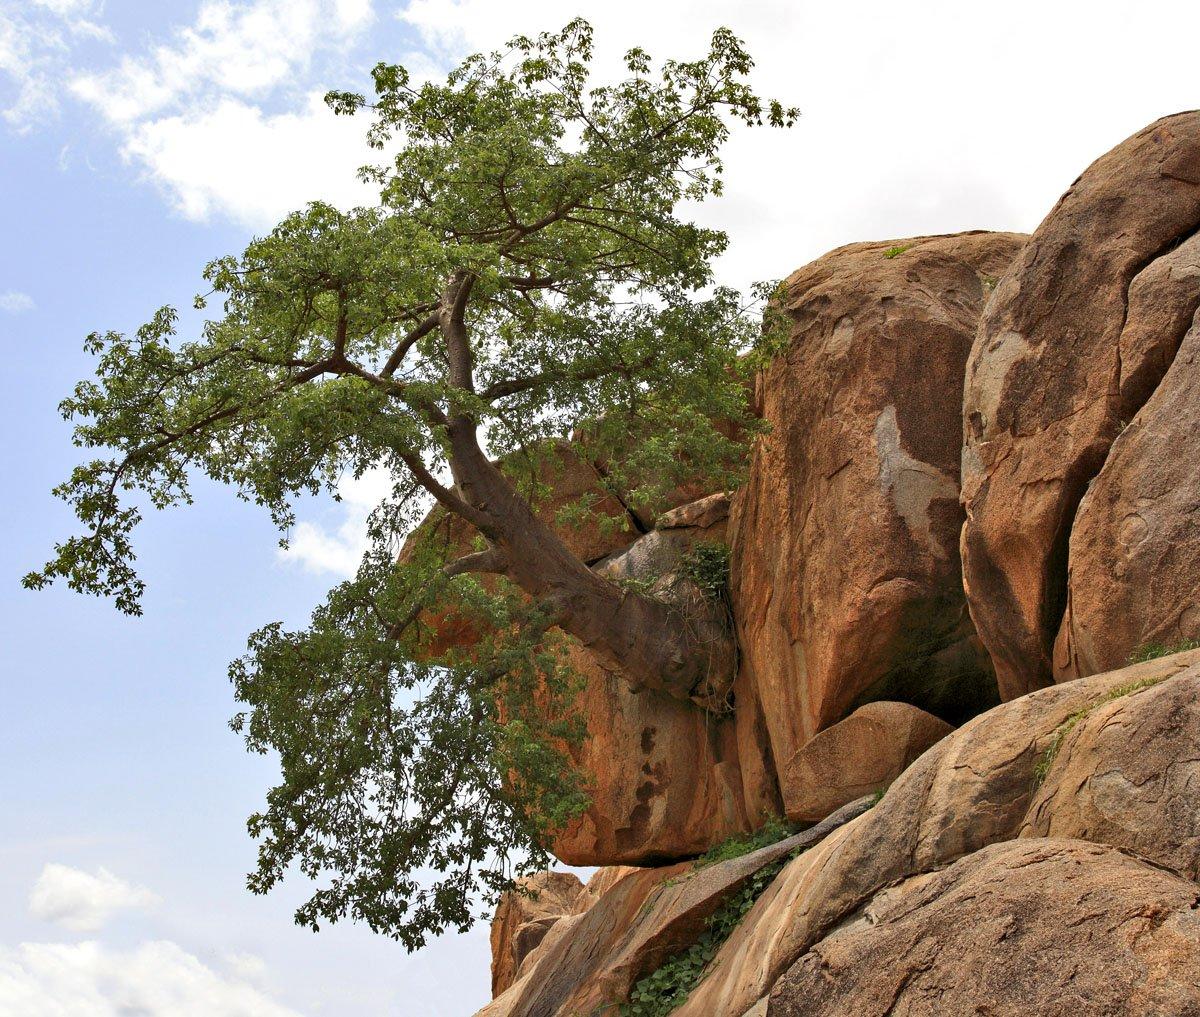 дерево, скалы, валуны, Олег Загидуллин